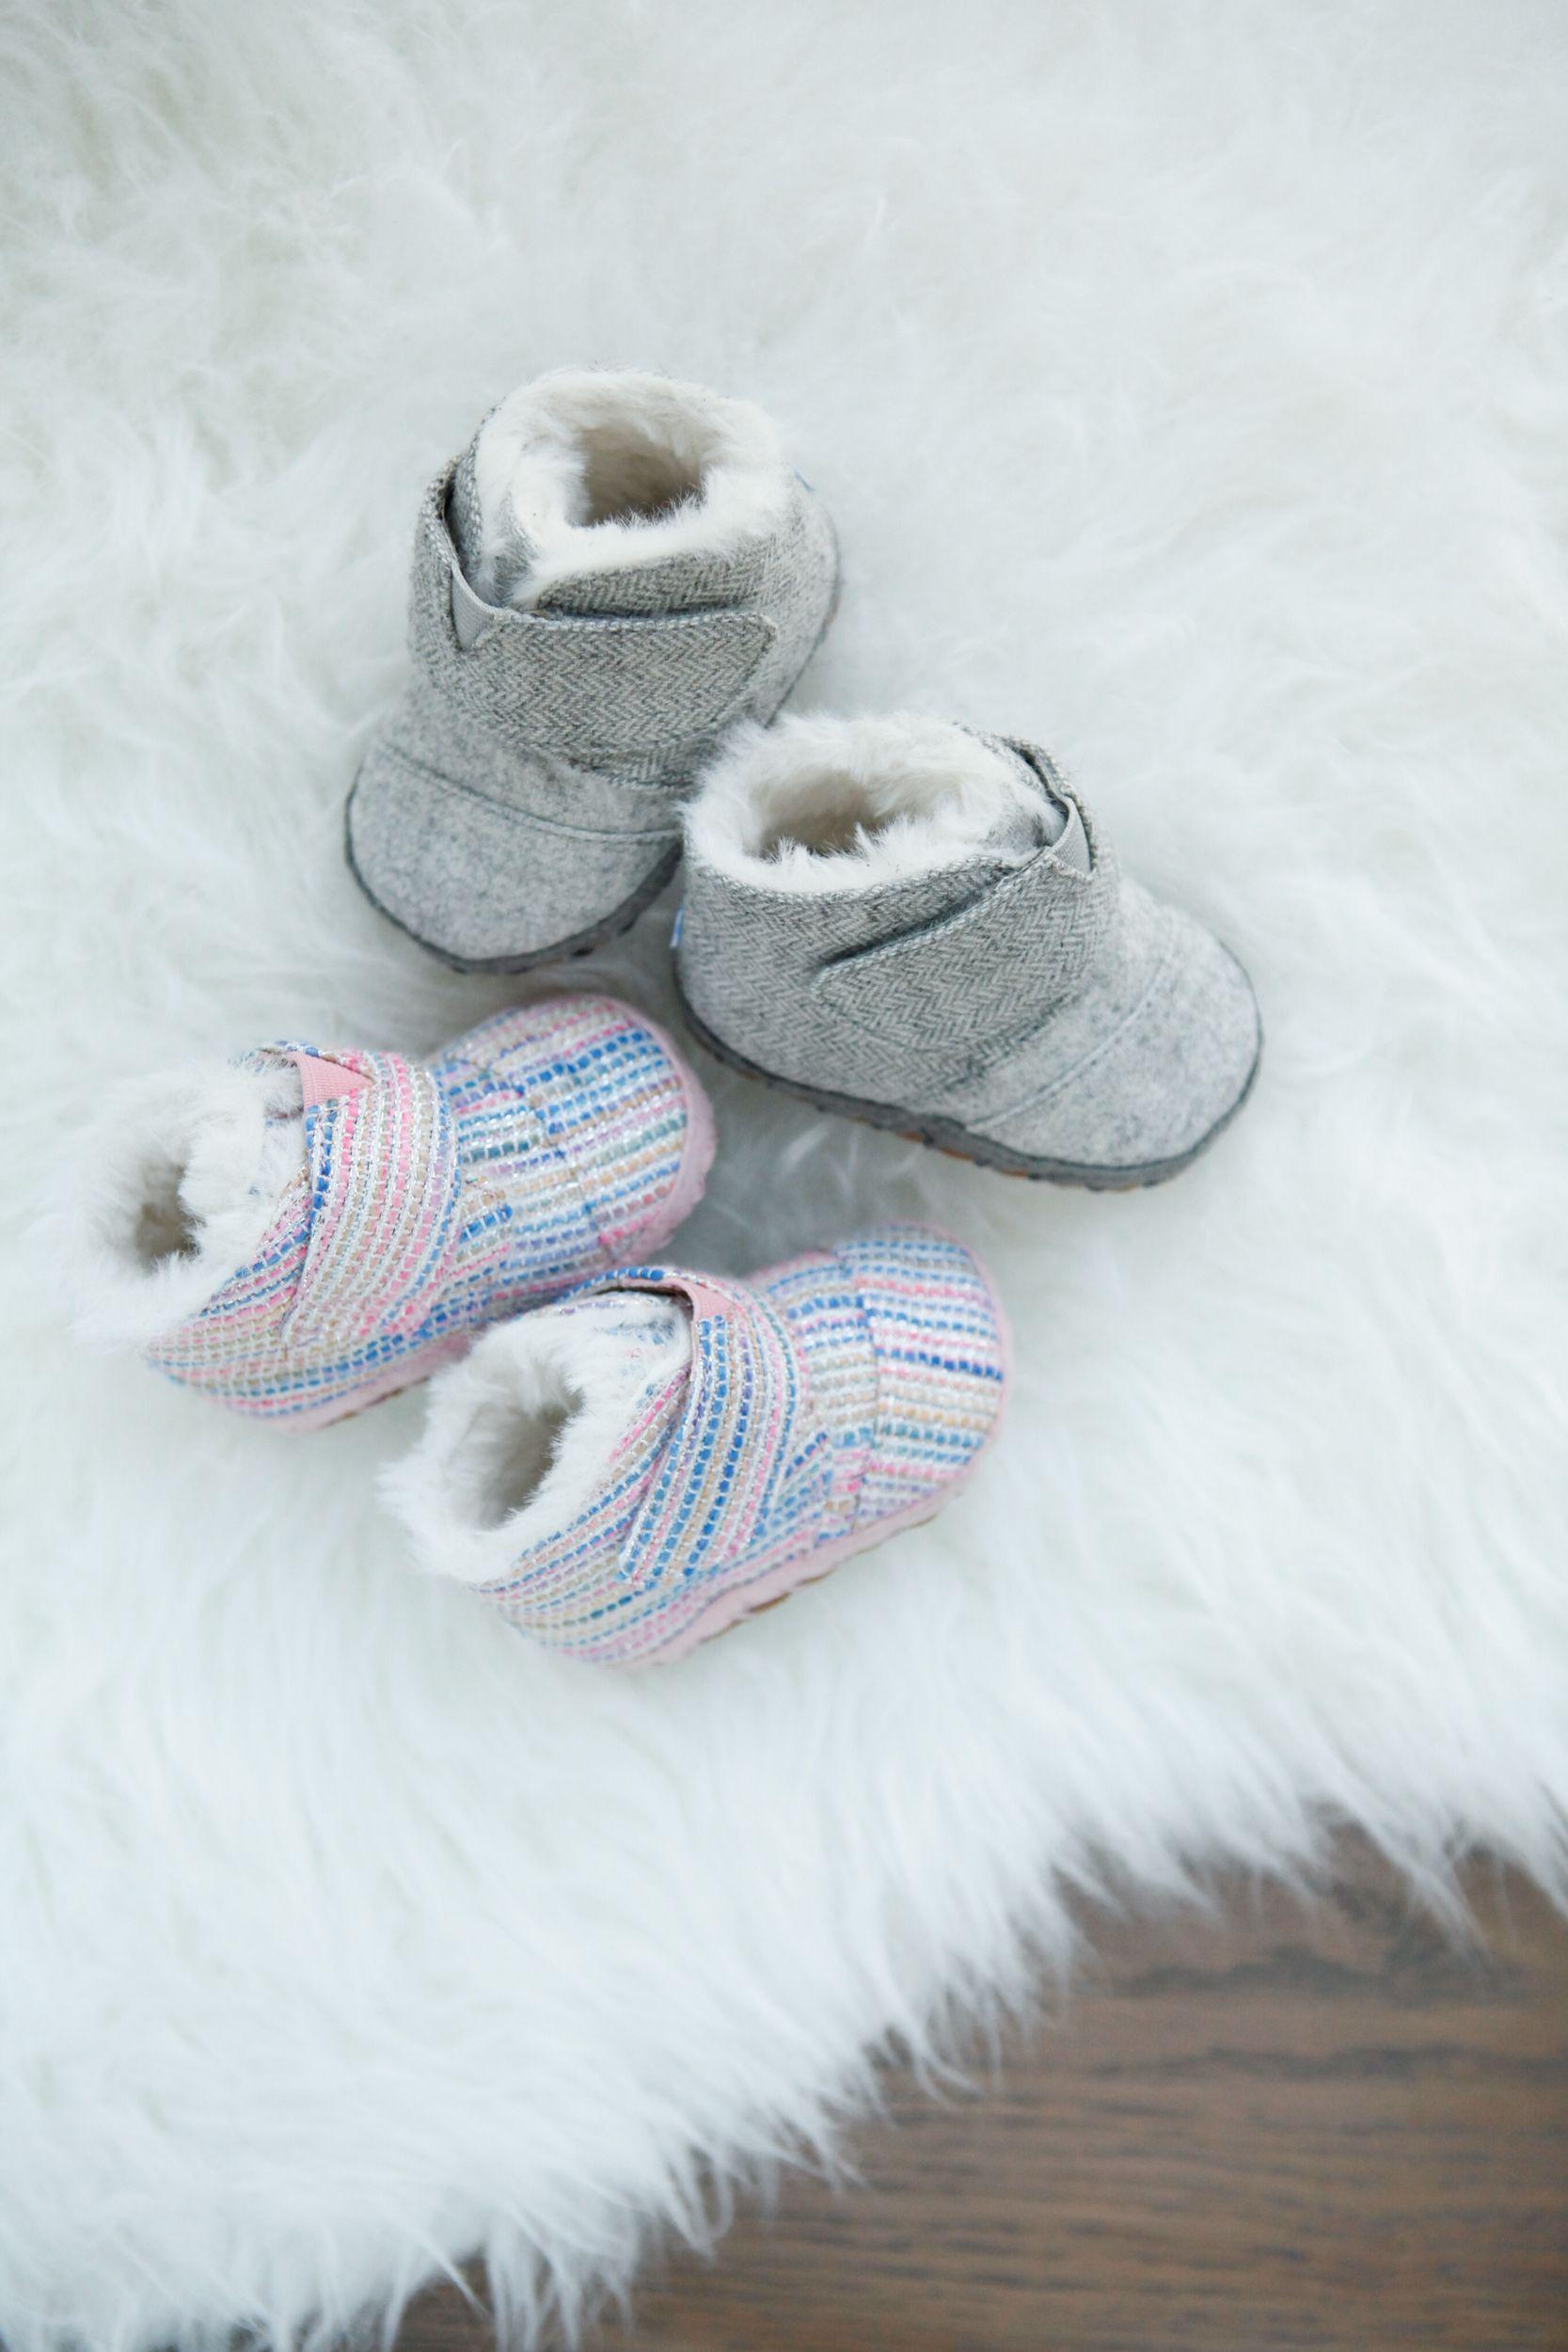 c shoes walker toms metallic nordstrom baby cribs crib toddler